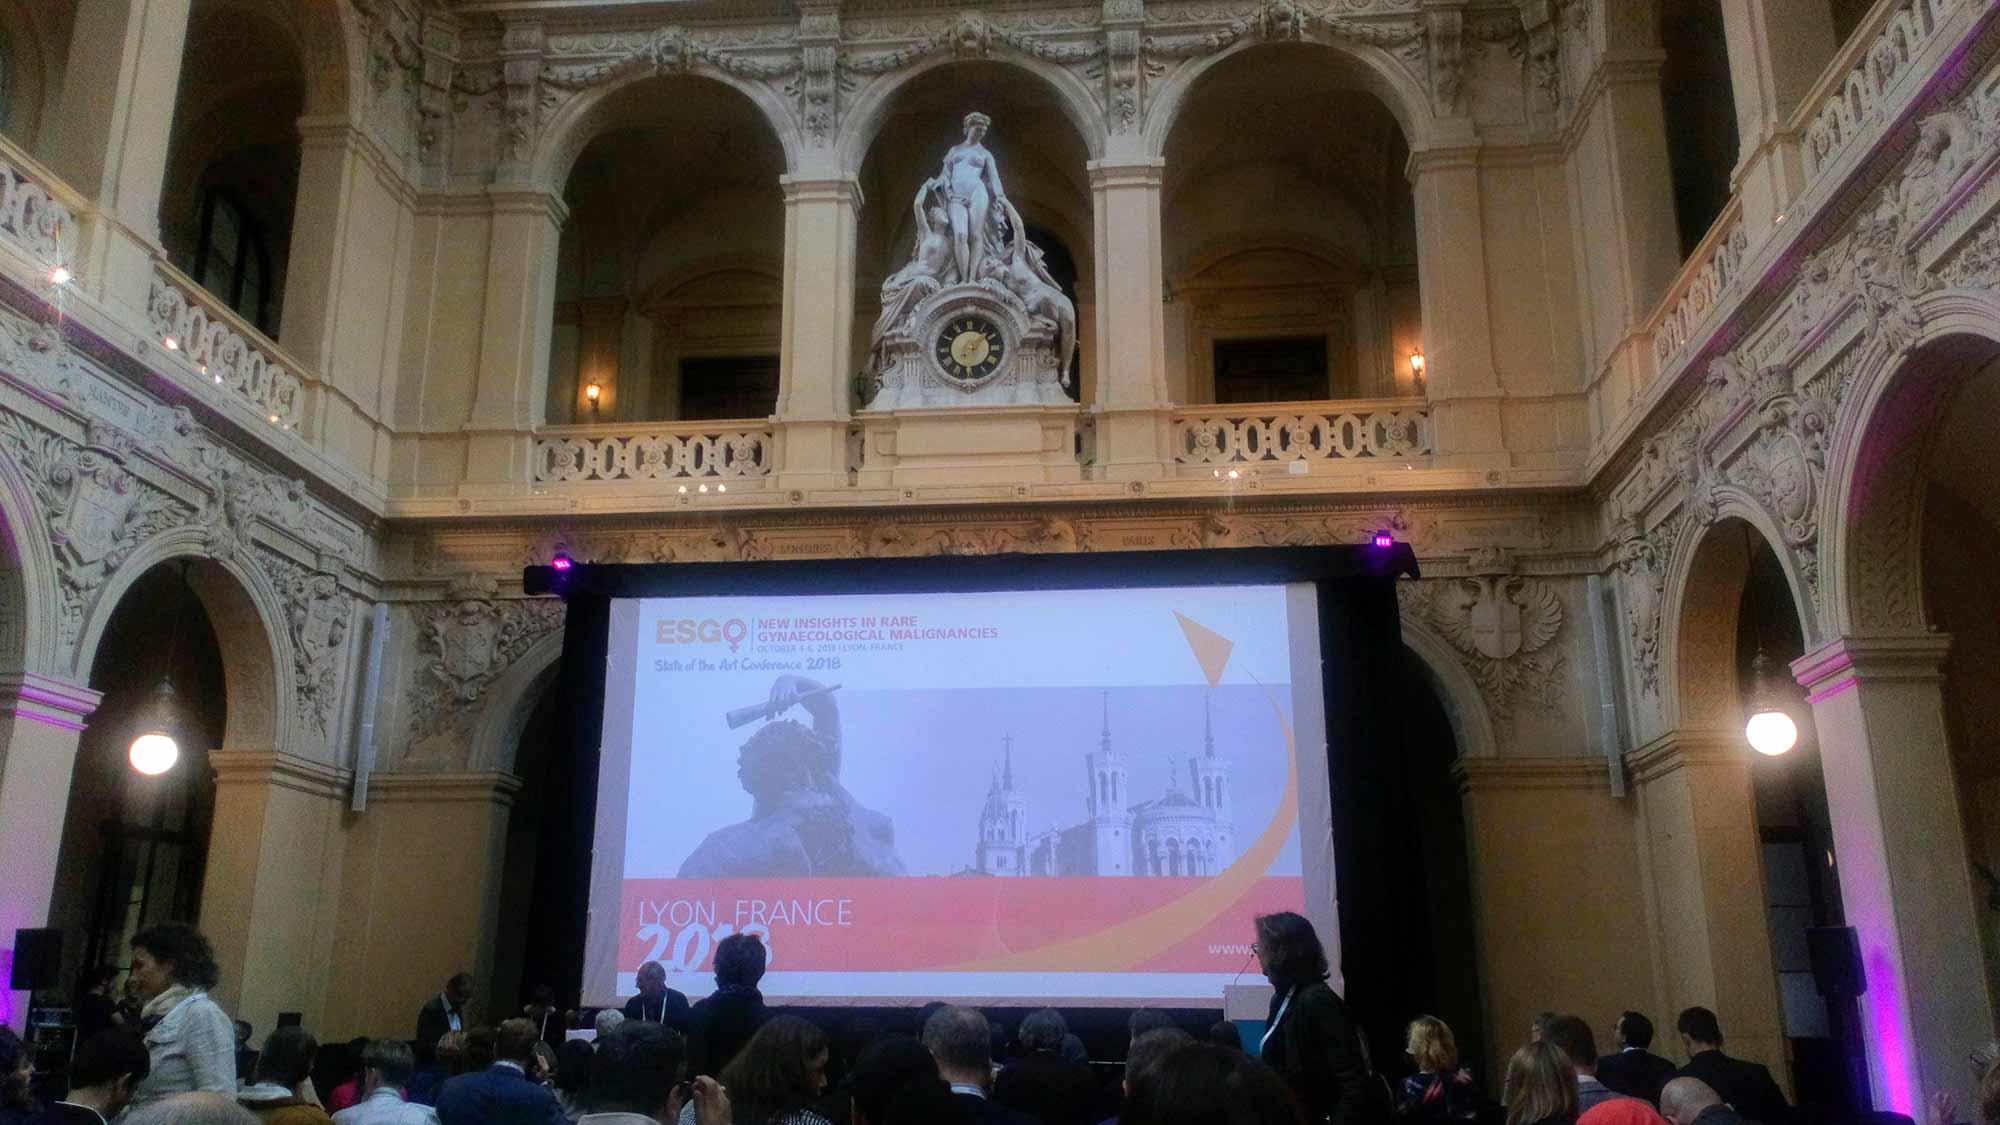 ESGO & ENGAGe konferenssi Ranskan Lyonissa 2018